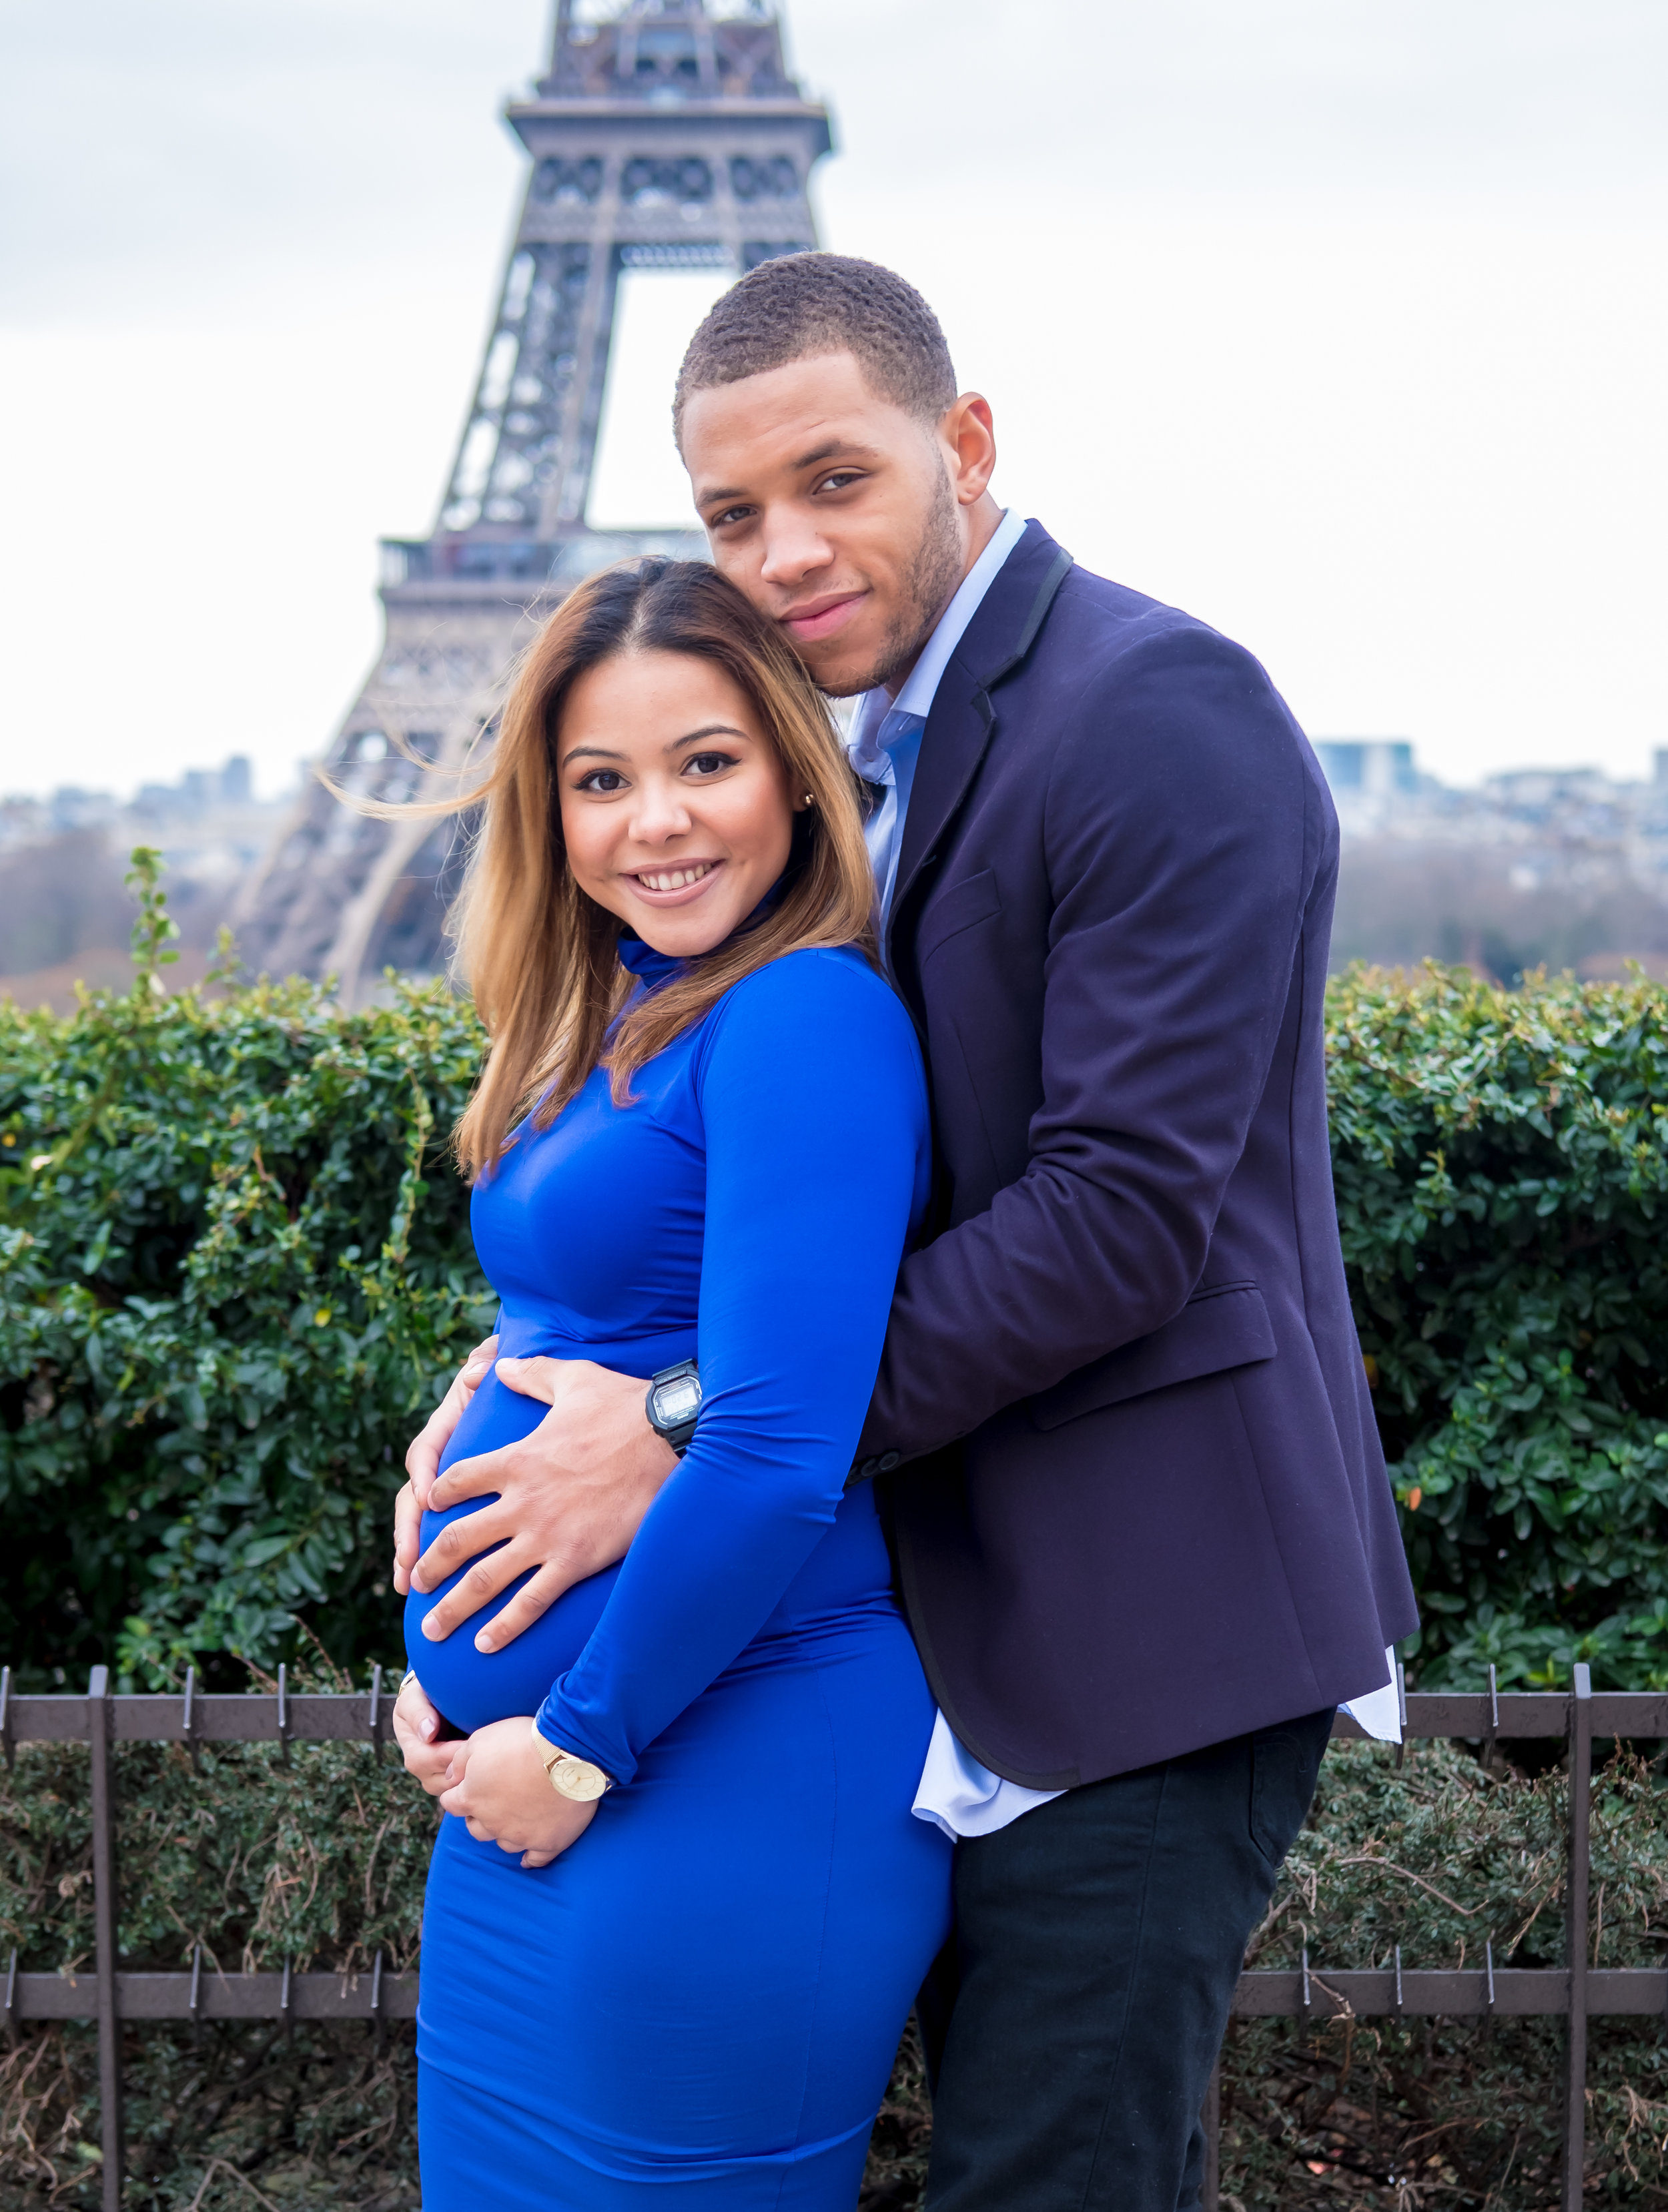 Paris maternity photo shoot